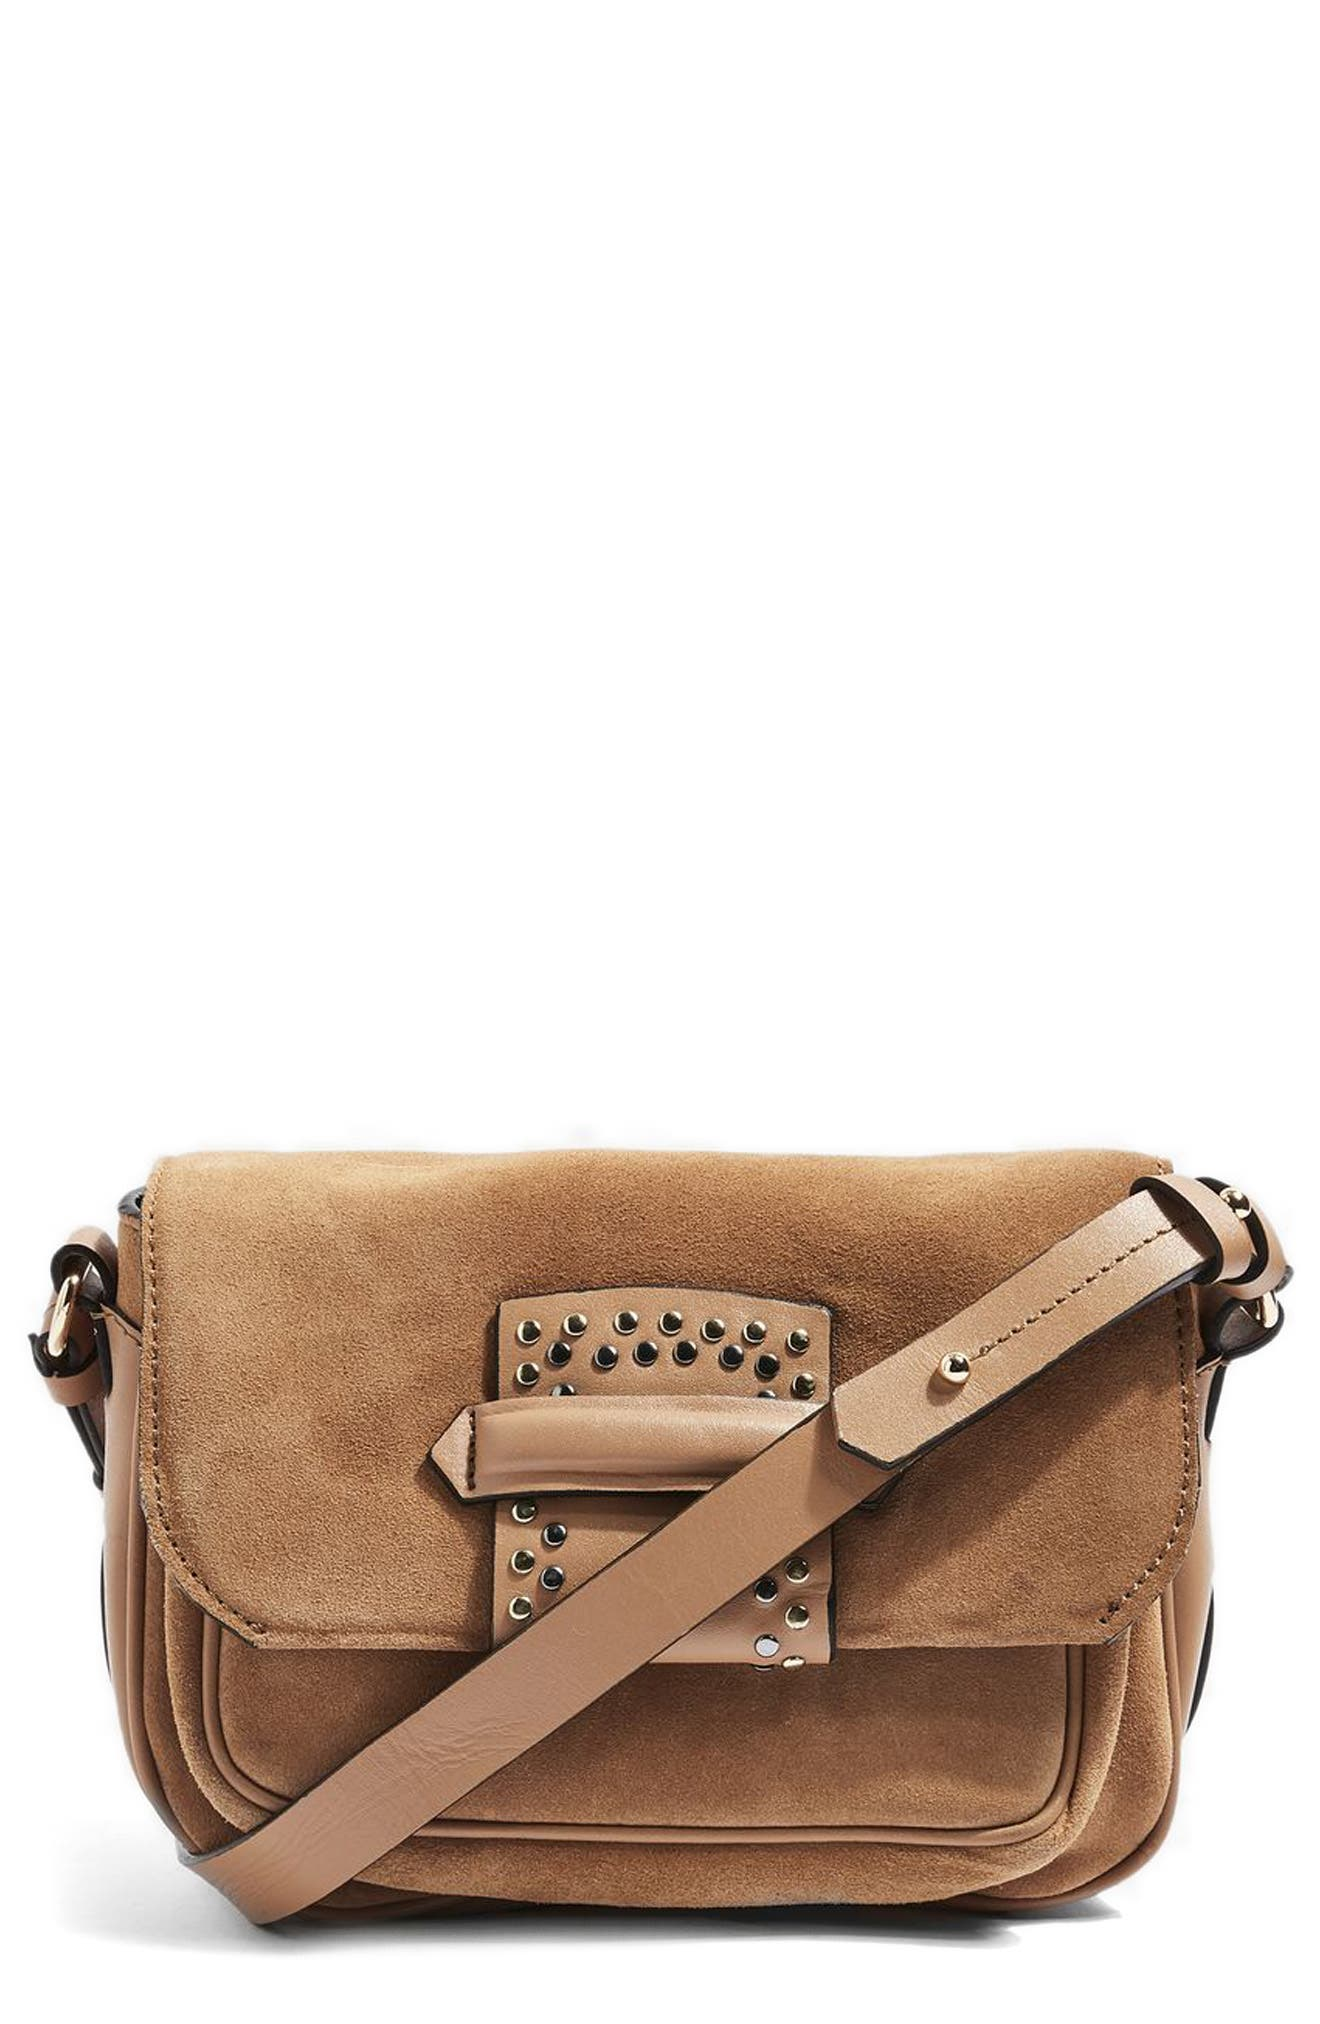 Topshop Premium Leather & Suede Crossbody Bag